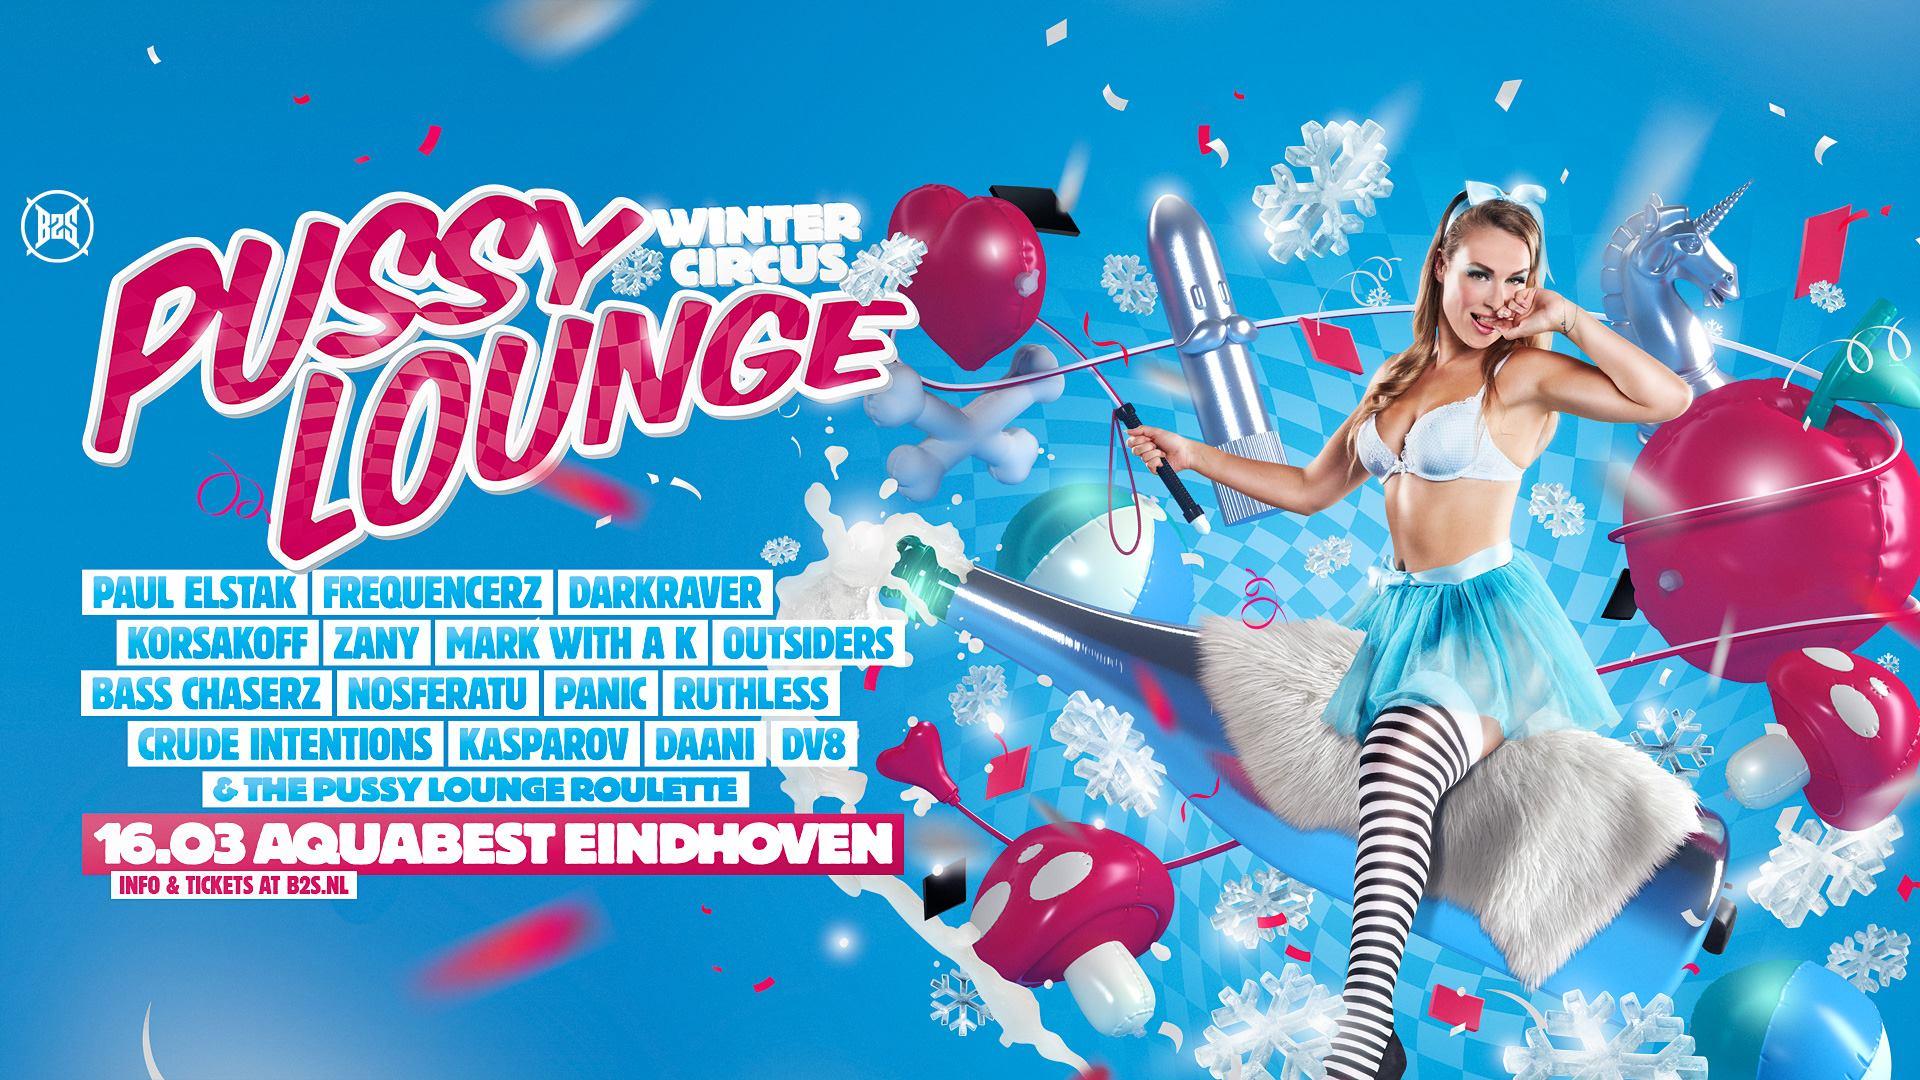 Pussy Lounge Wintercircus 2019